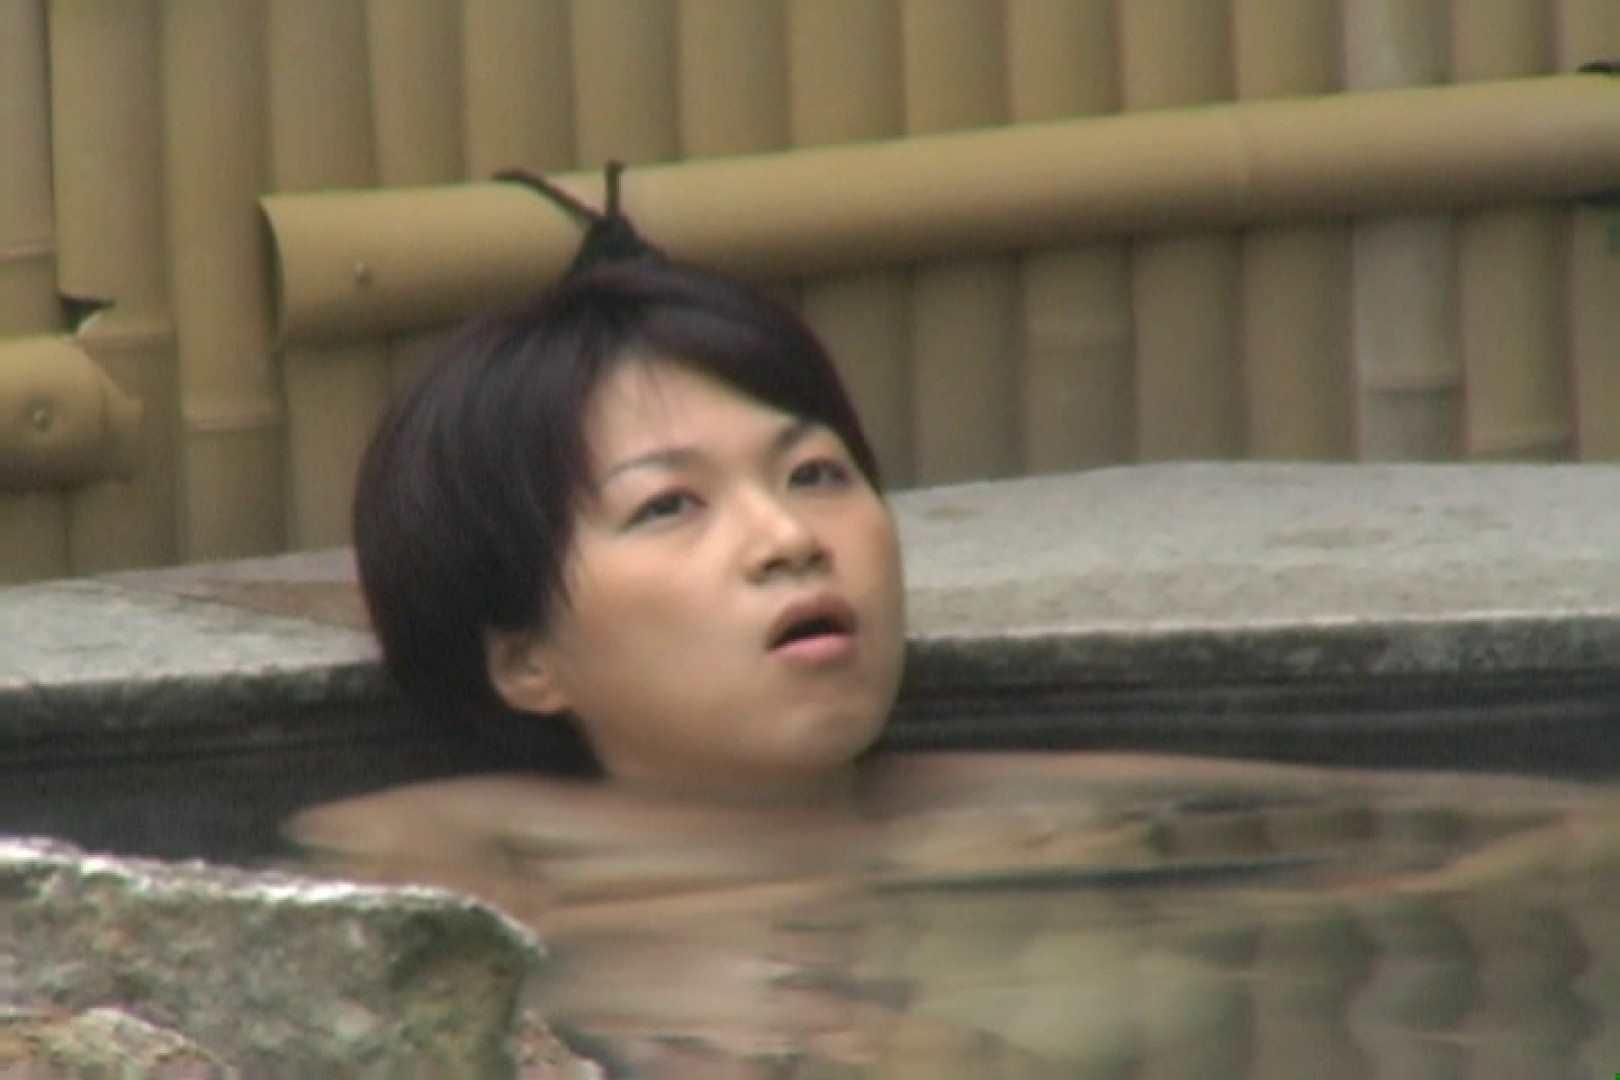 Aquaな露天風呂Vol.624 露天風呂編  88PIX 48